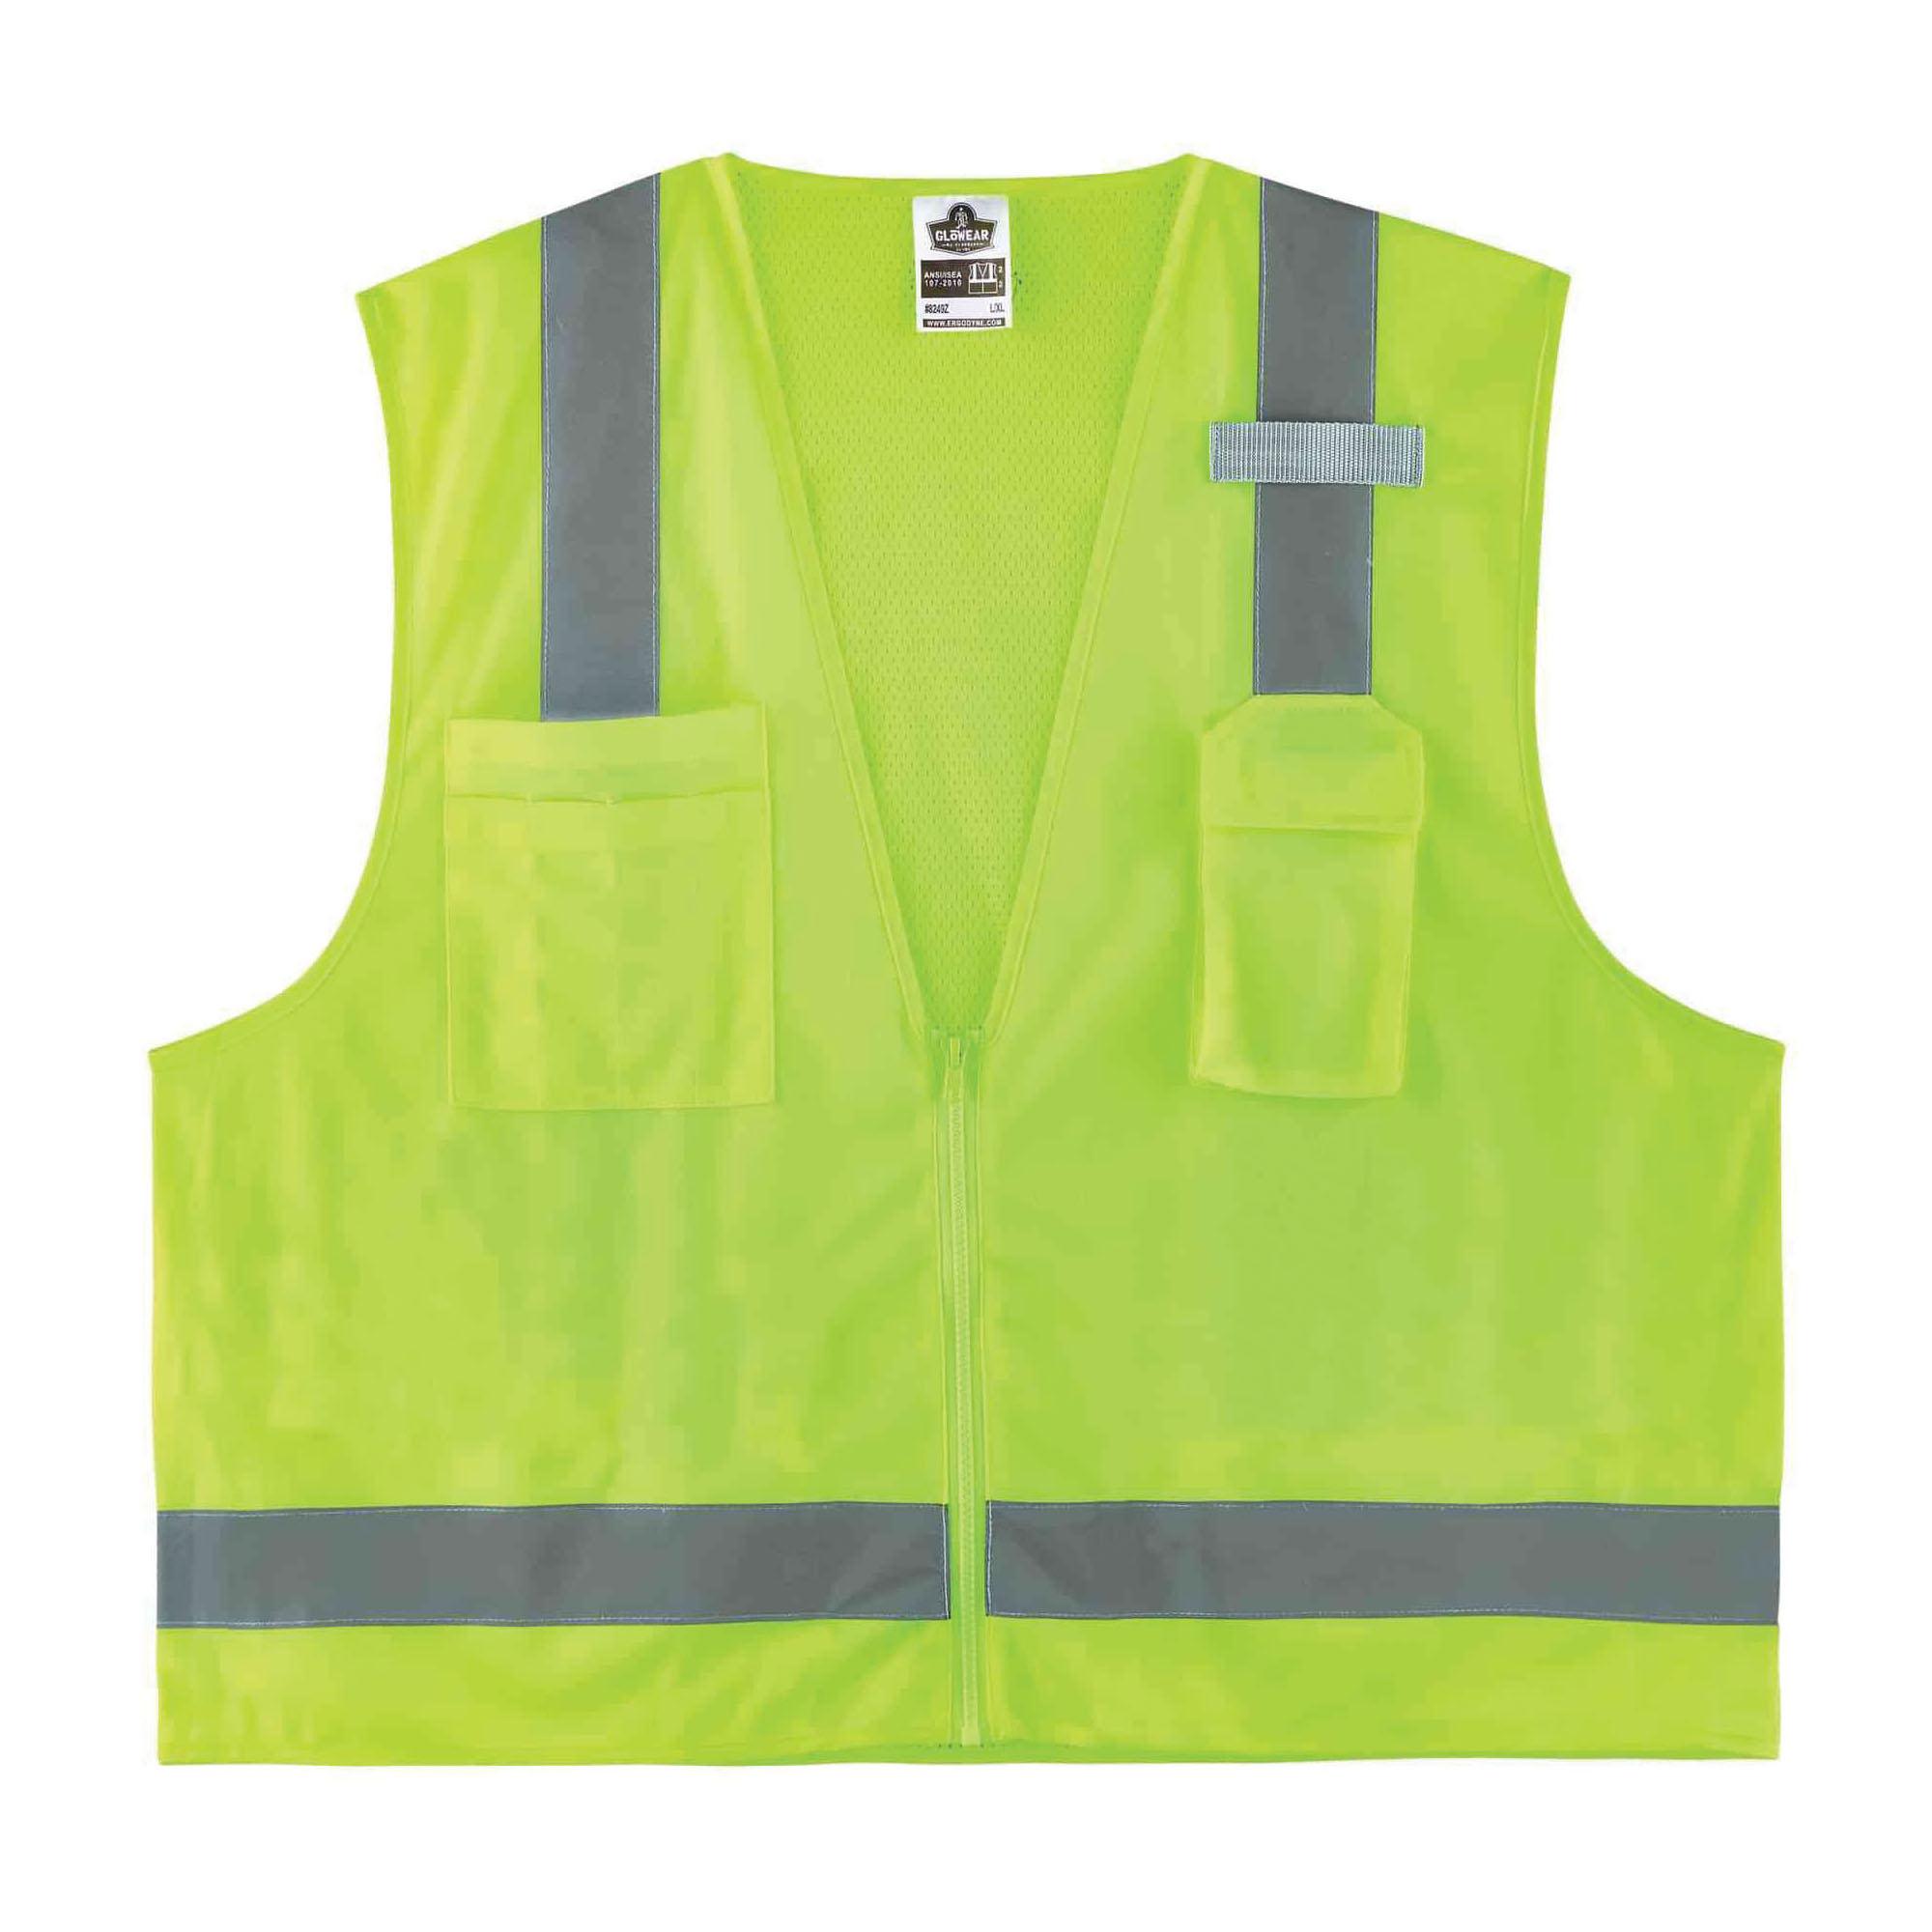 GloWear® 8249Z Economy Surveyor Safety Vest, Hi-Viz Lime, Polyester Mesh/Solid, Zipper Closure, 4 Pockets, ANSI Class: Class 2, ANSI/ISEA 107-2015 Type R